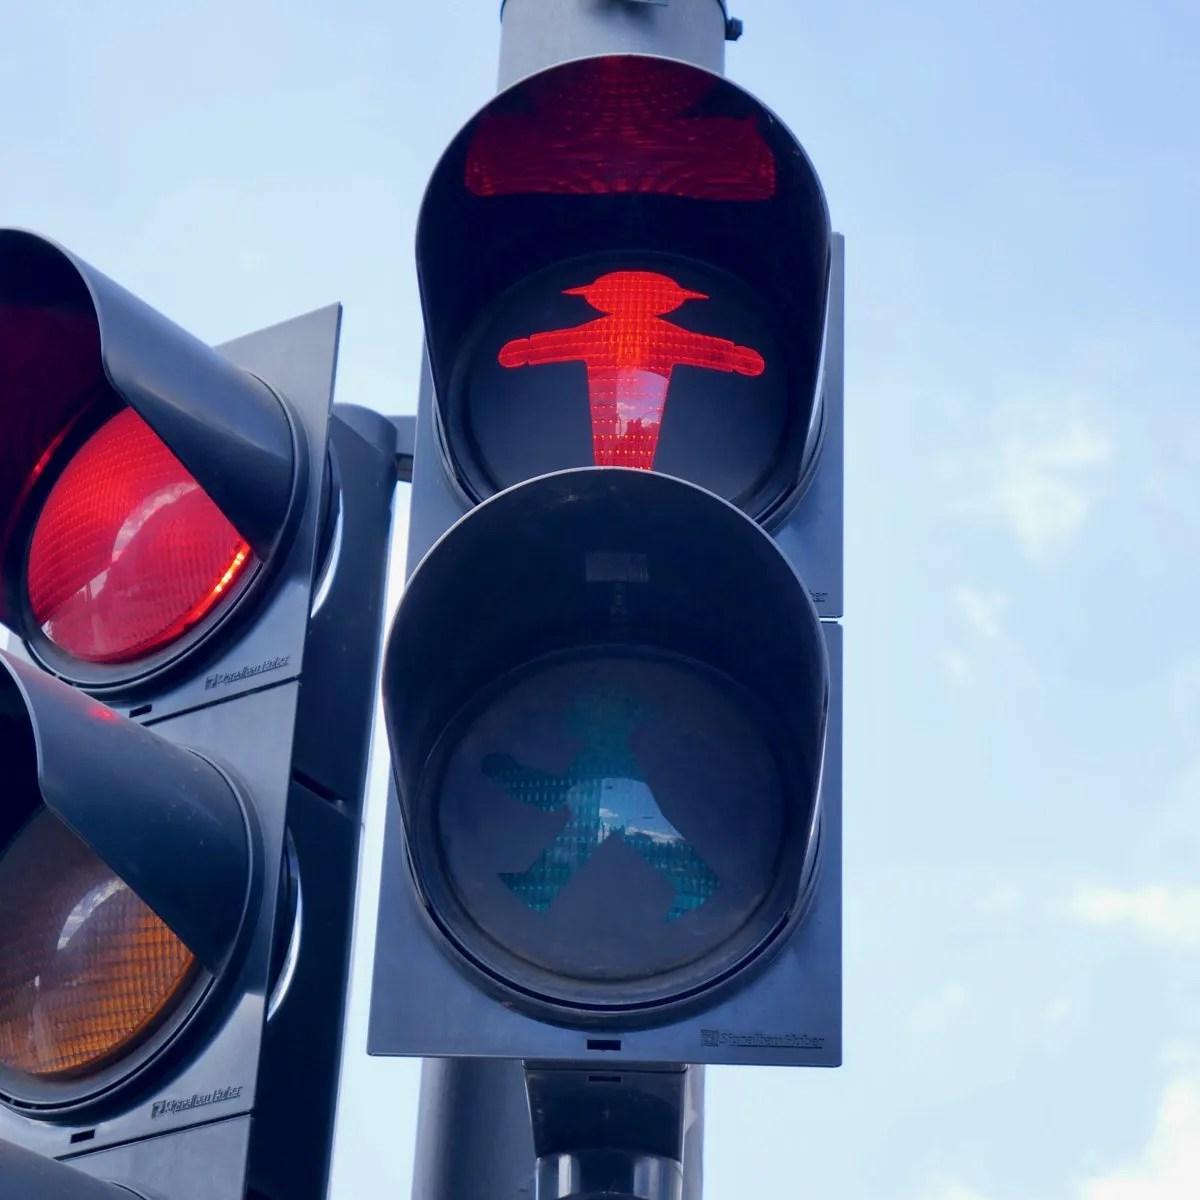 Red Crossing Ampelmannchen Berlin